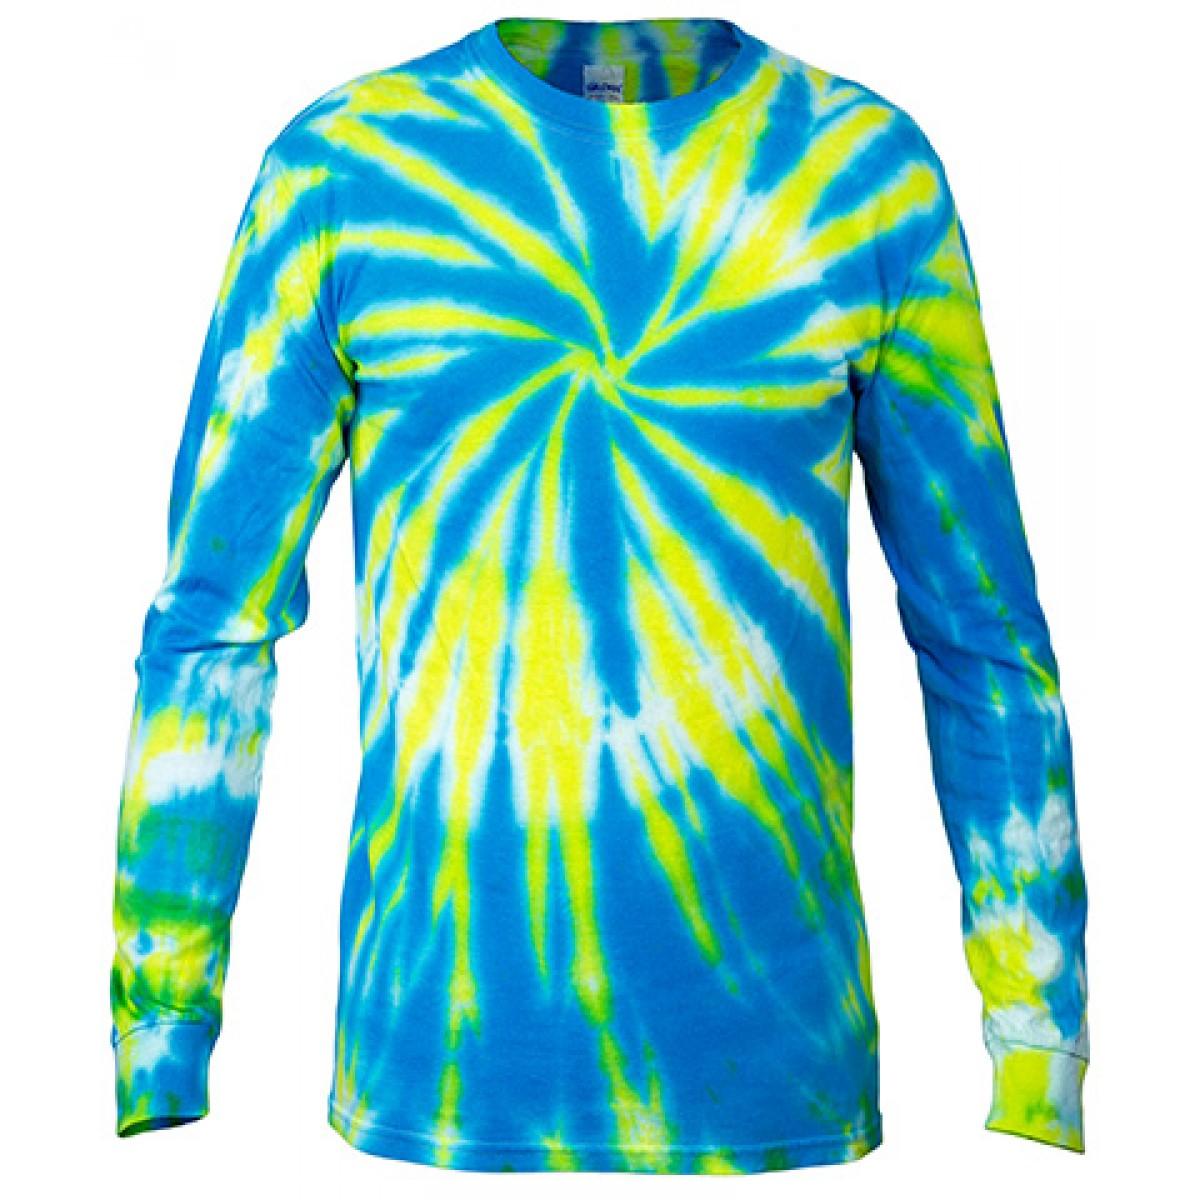 Multi Color Tie-Dye Long Sleeve Shirt -Blue-YM